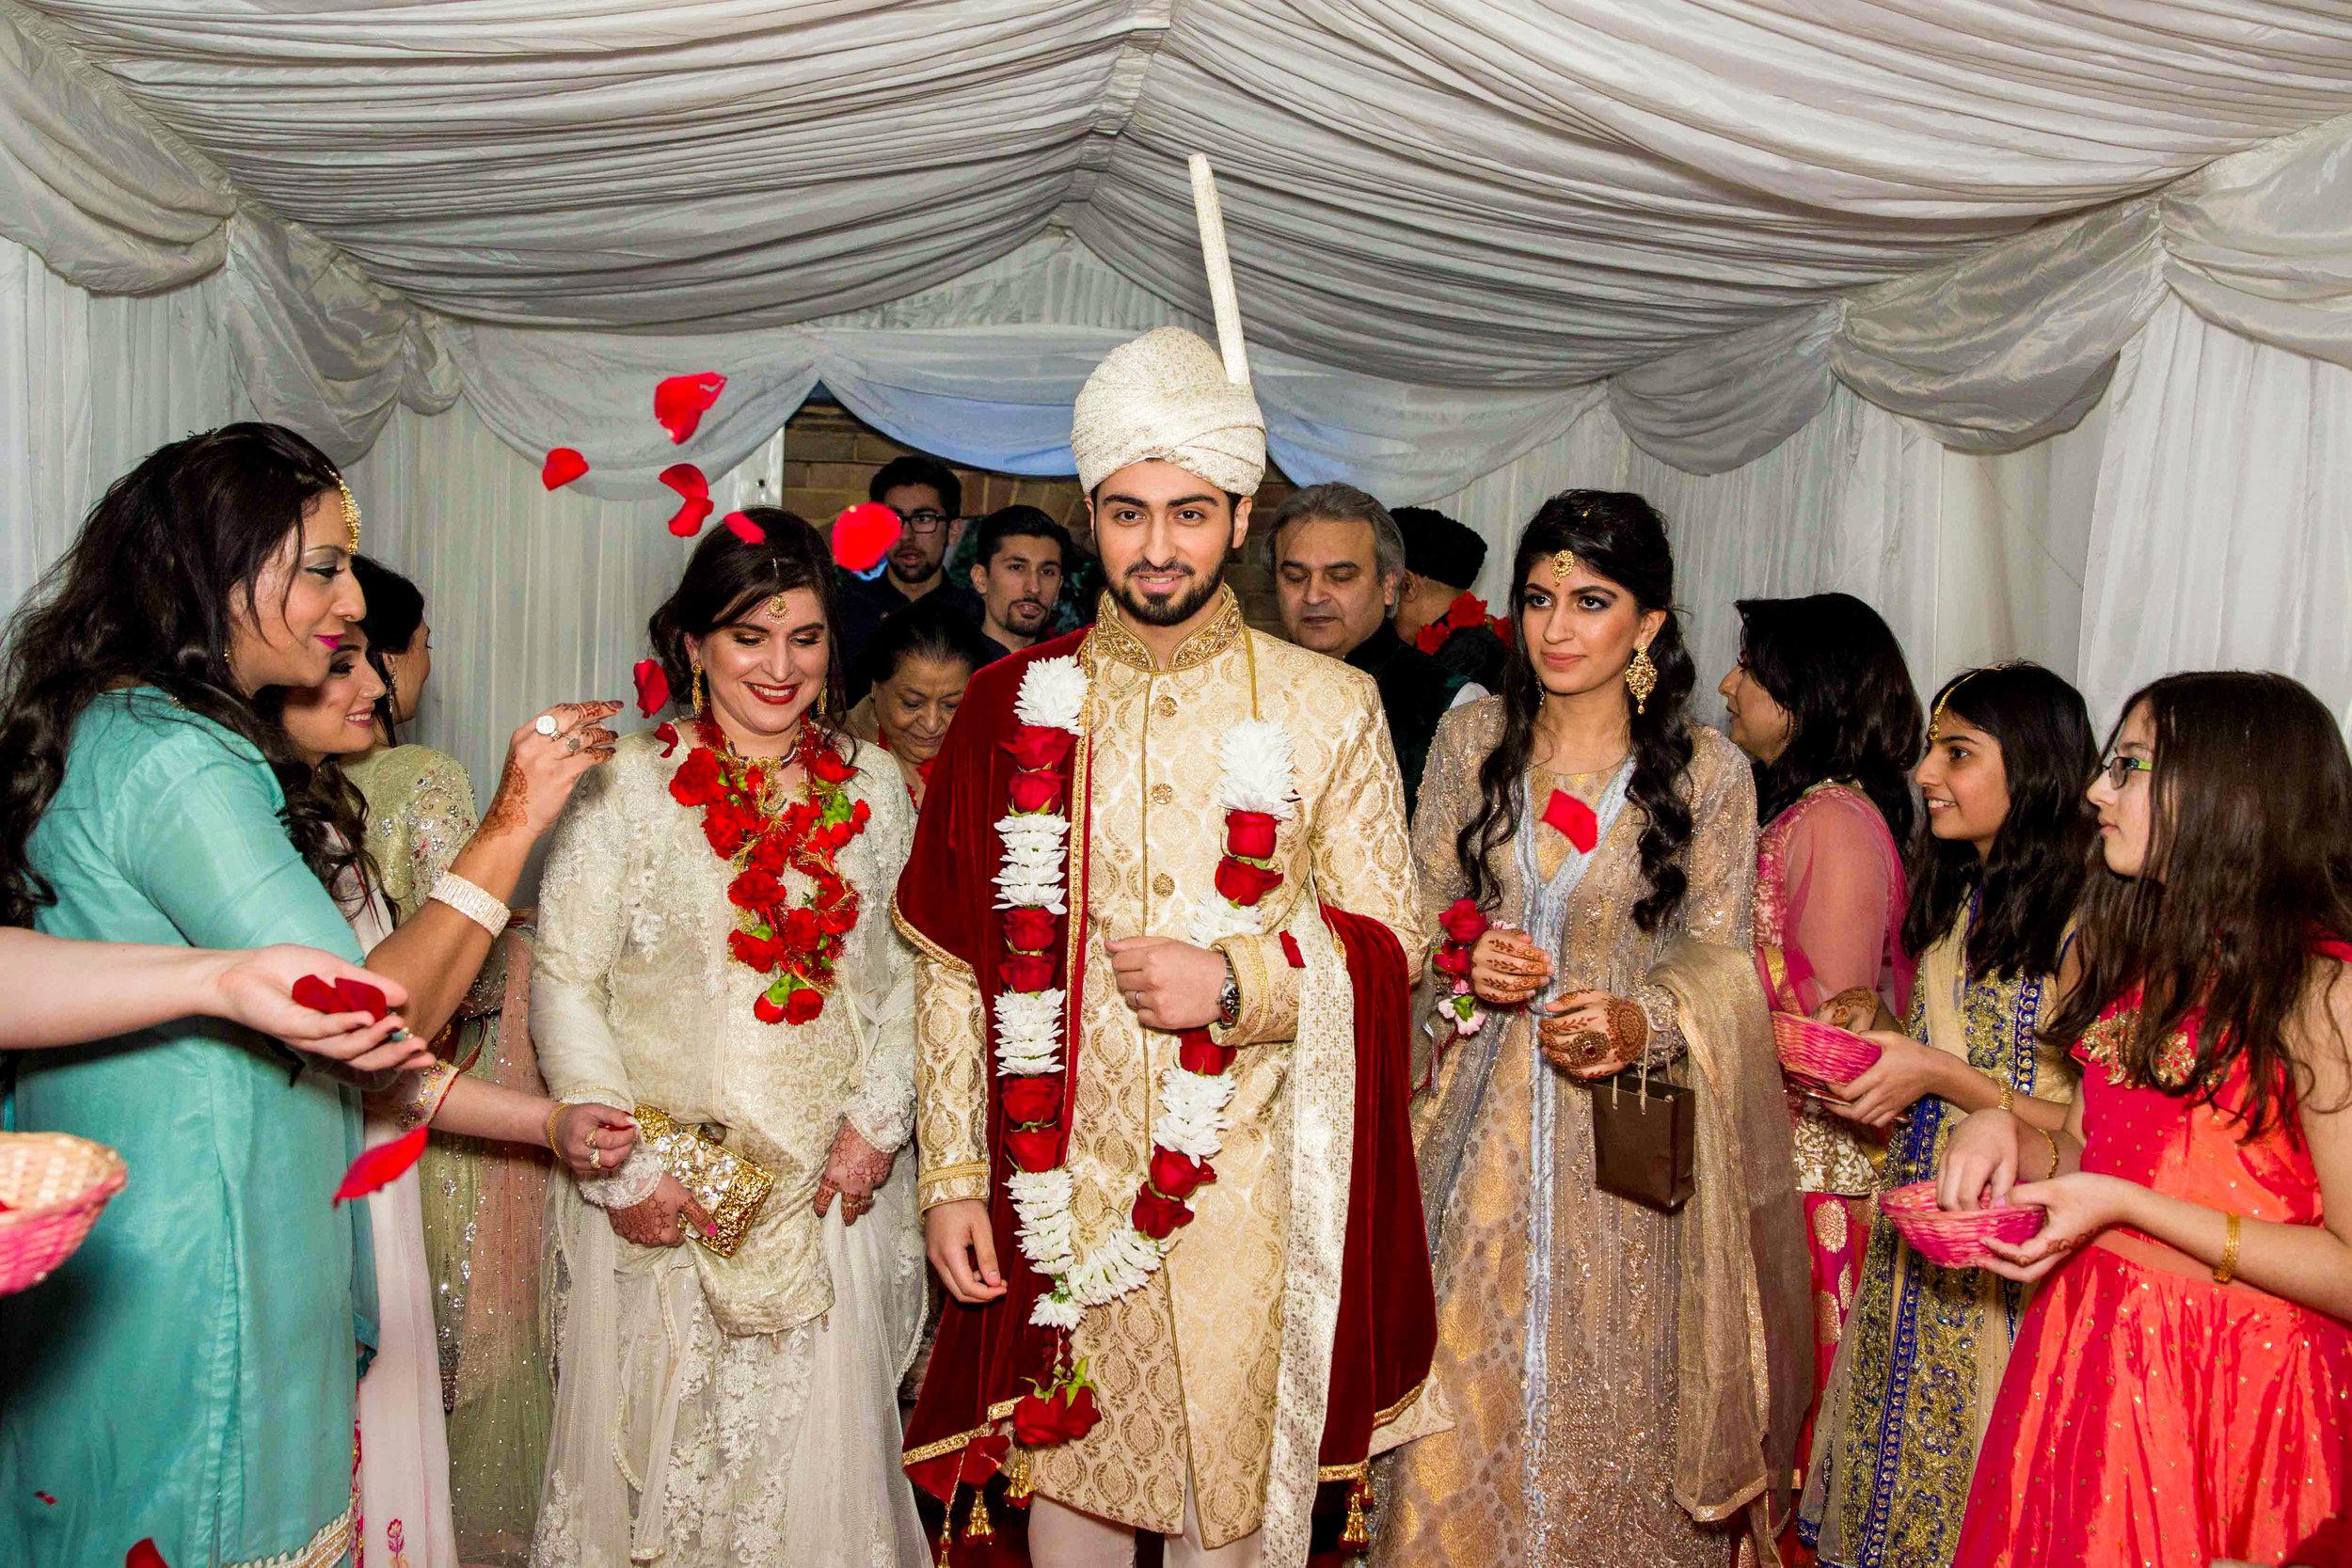 Macdonald-Berystede-Hotel-wedding-female-asian-wedding-photographer-london-natalia-smith-photography-51-2.jpg